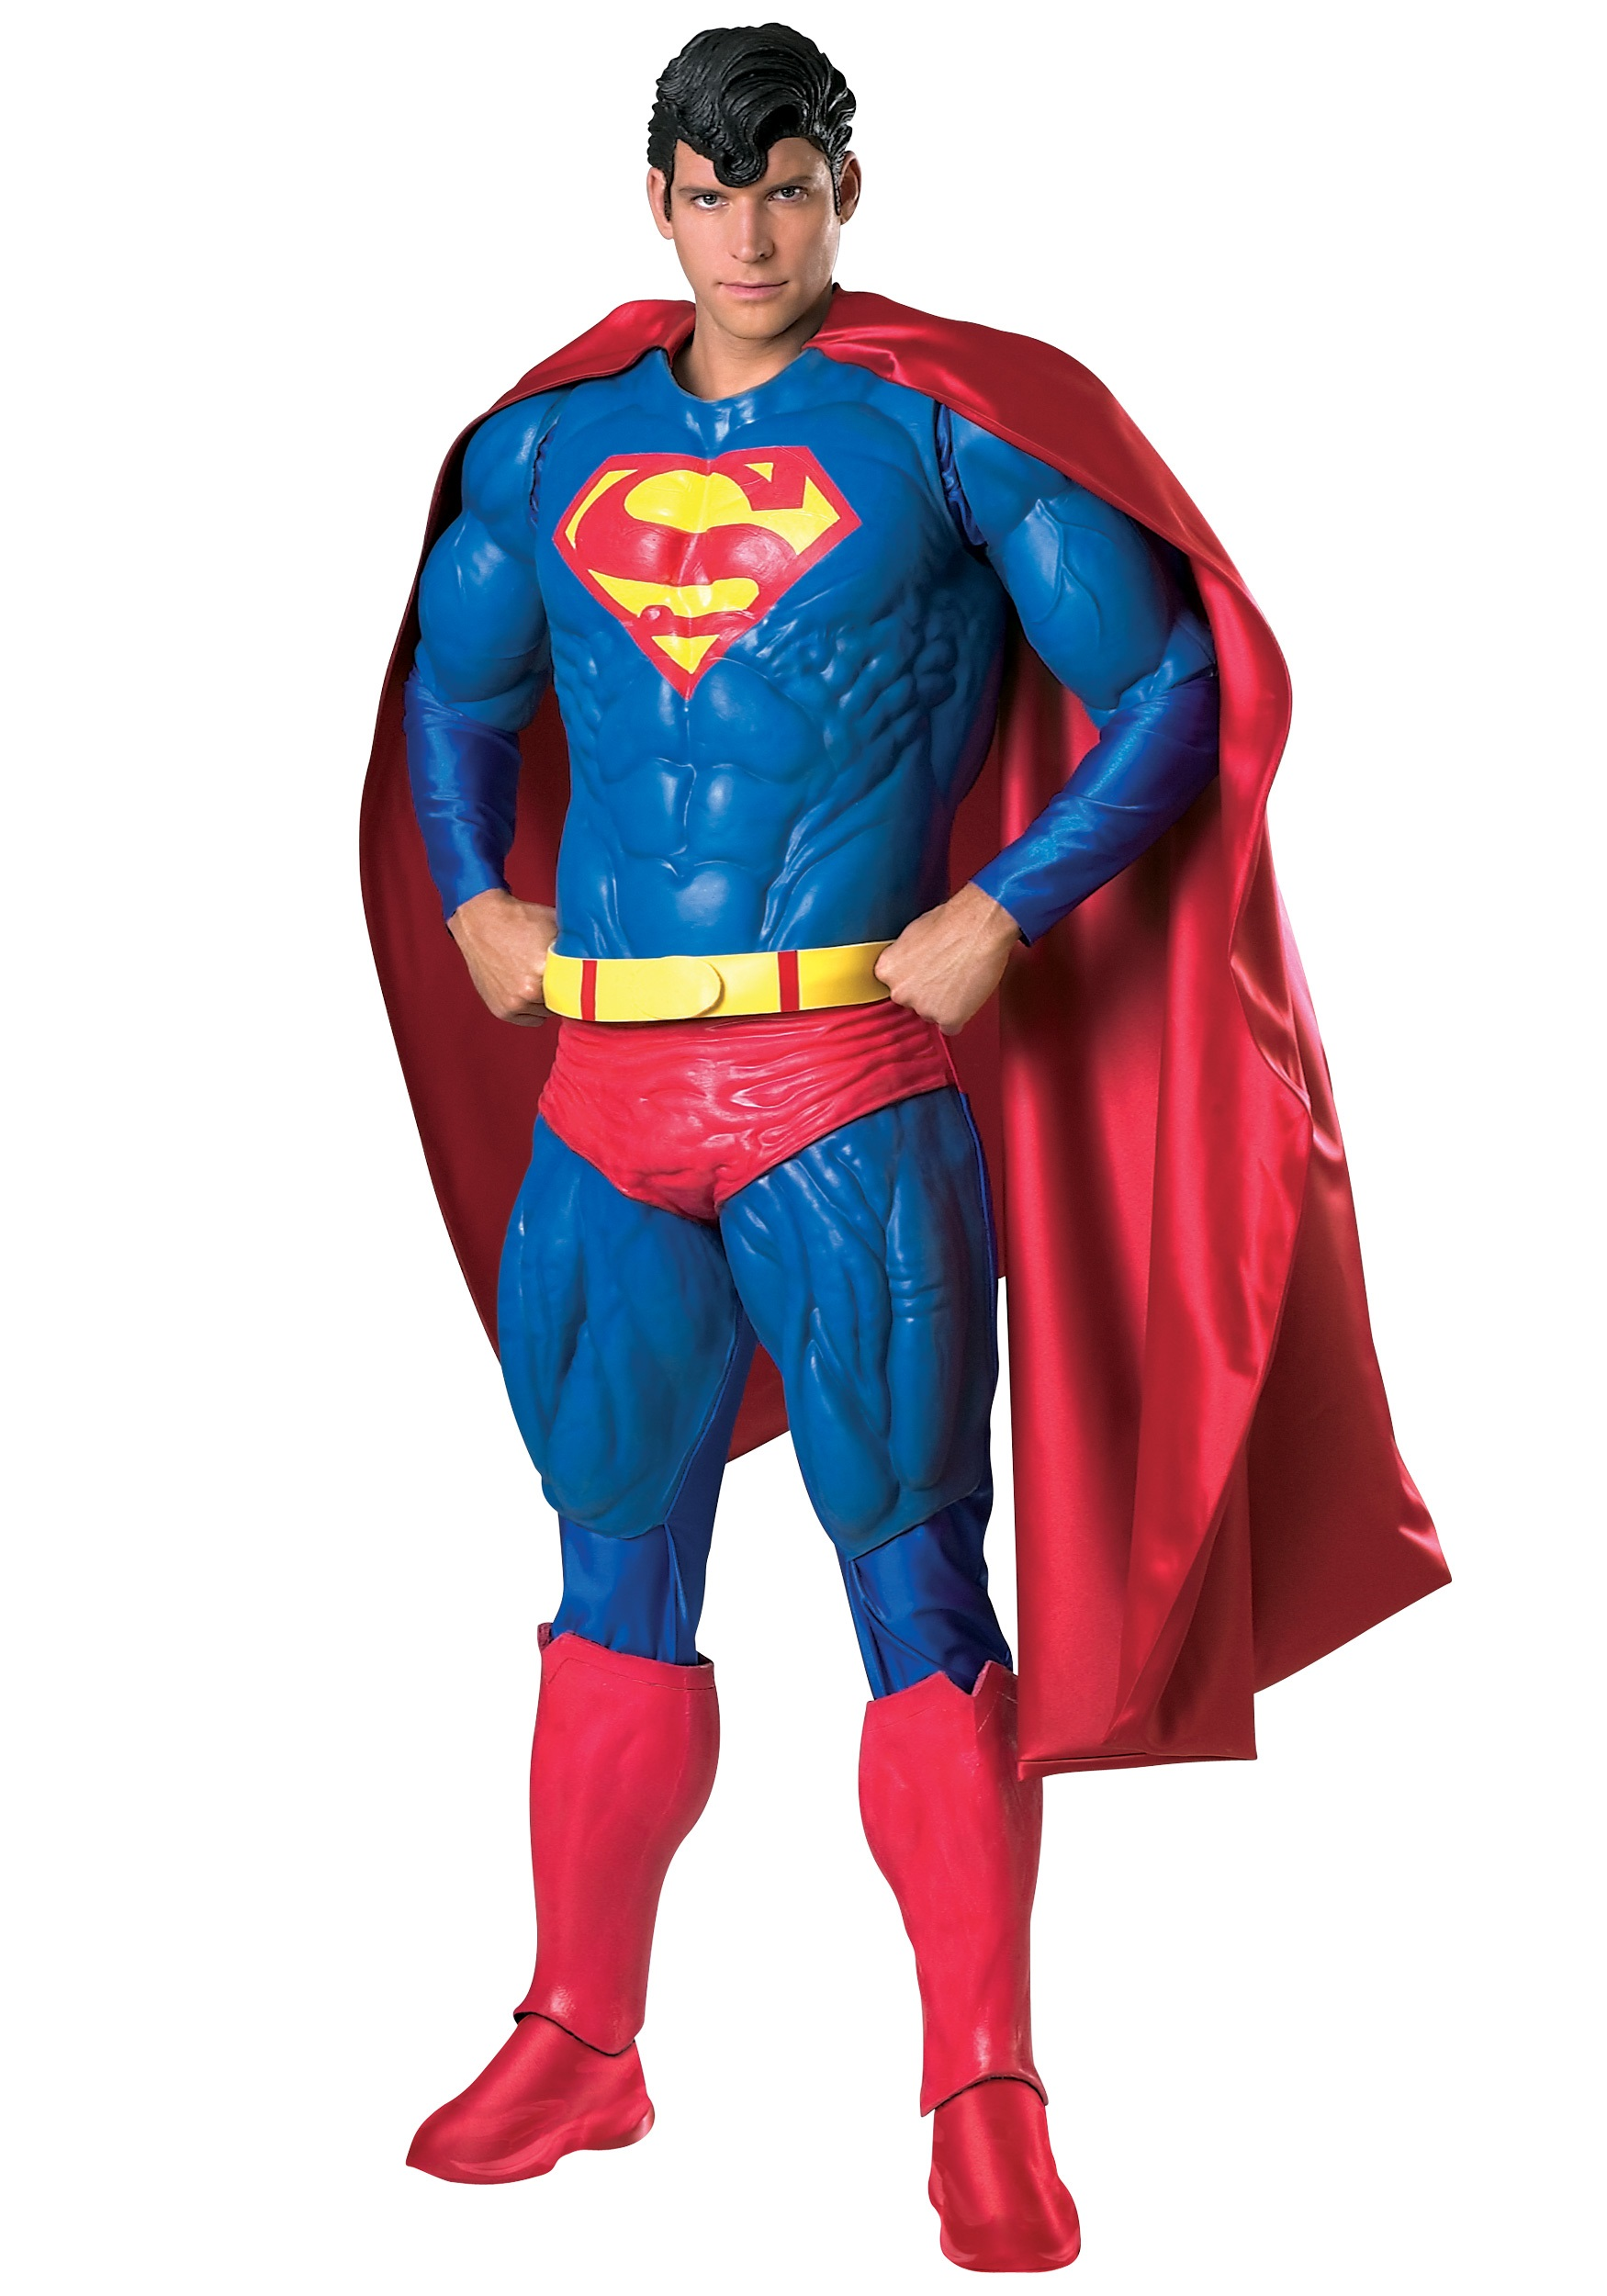 Adult collectors superman costume